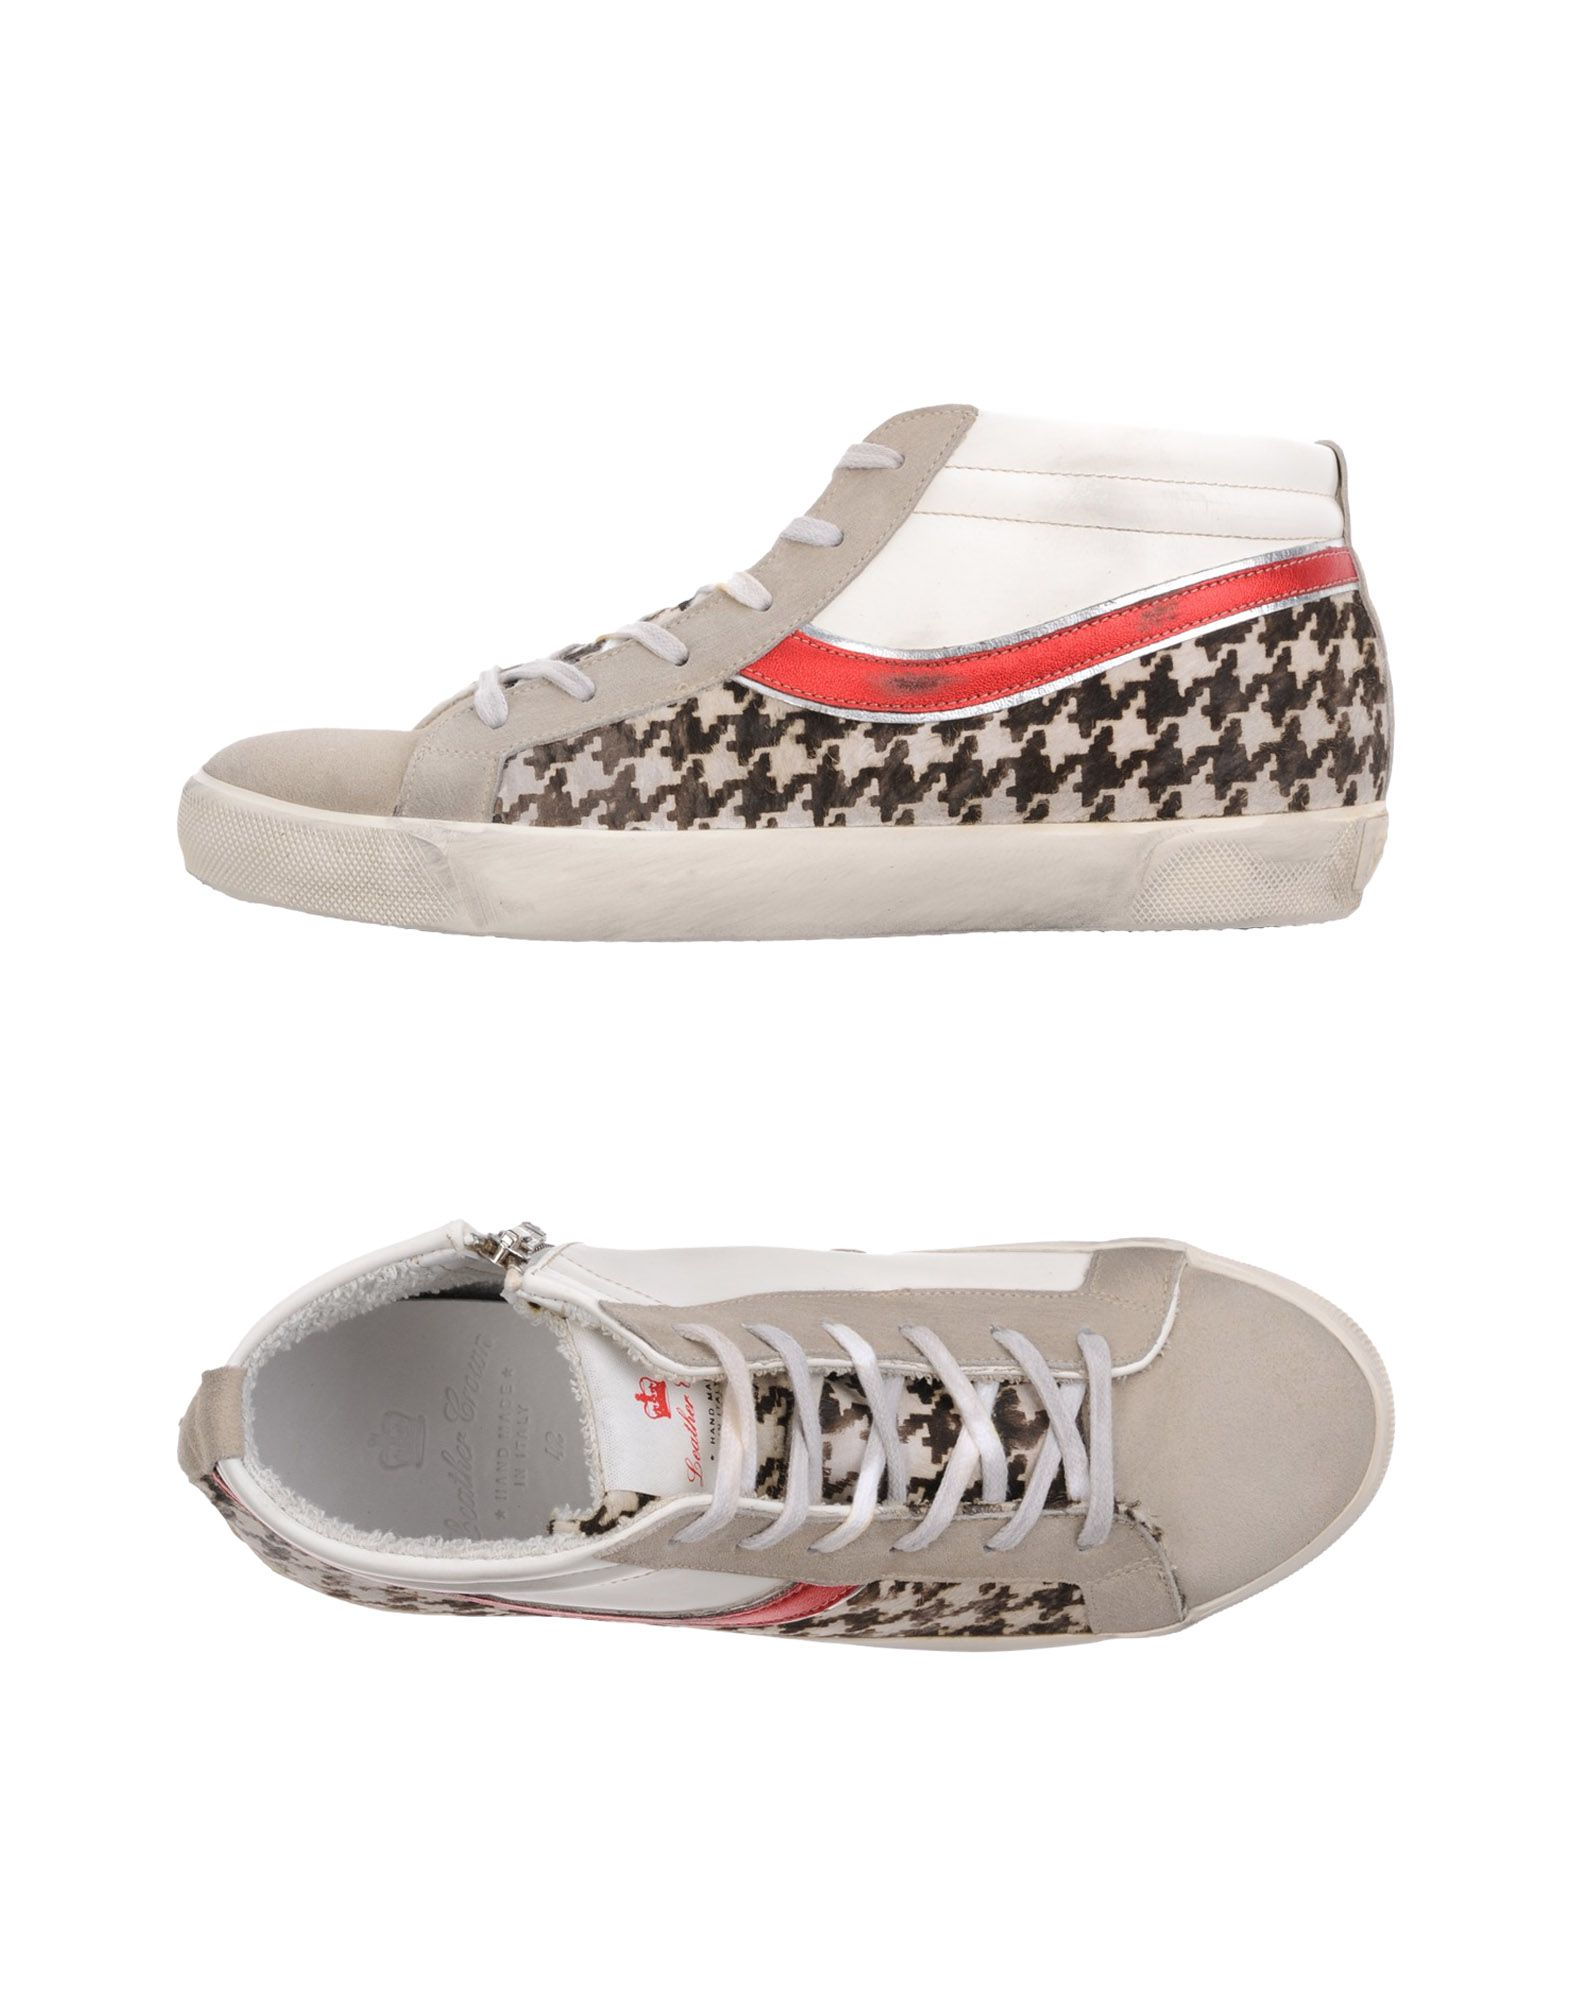 Leather Crown Sneakers Herren  11288477JJ Gute Qualität beliebte Schuhe